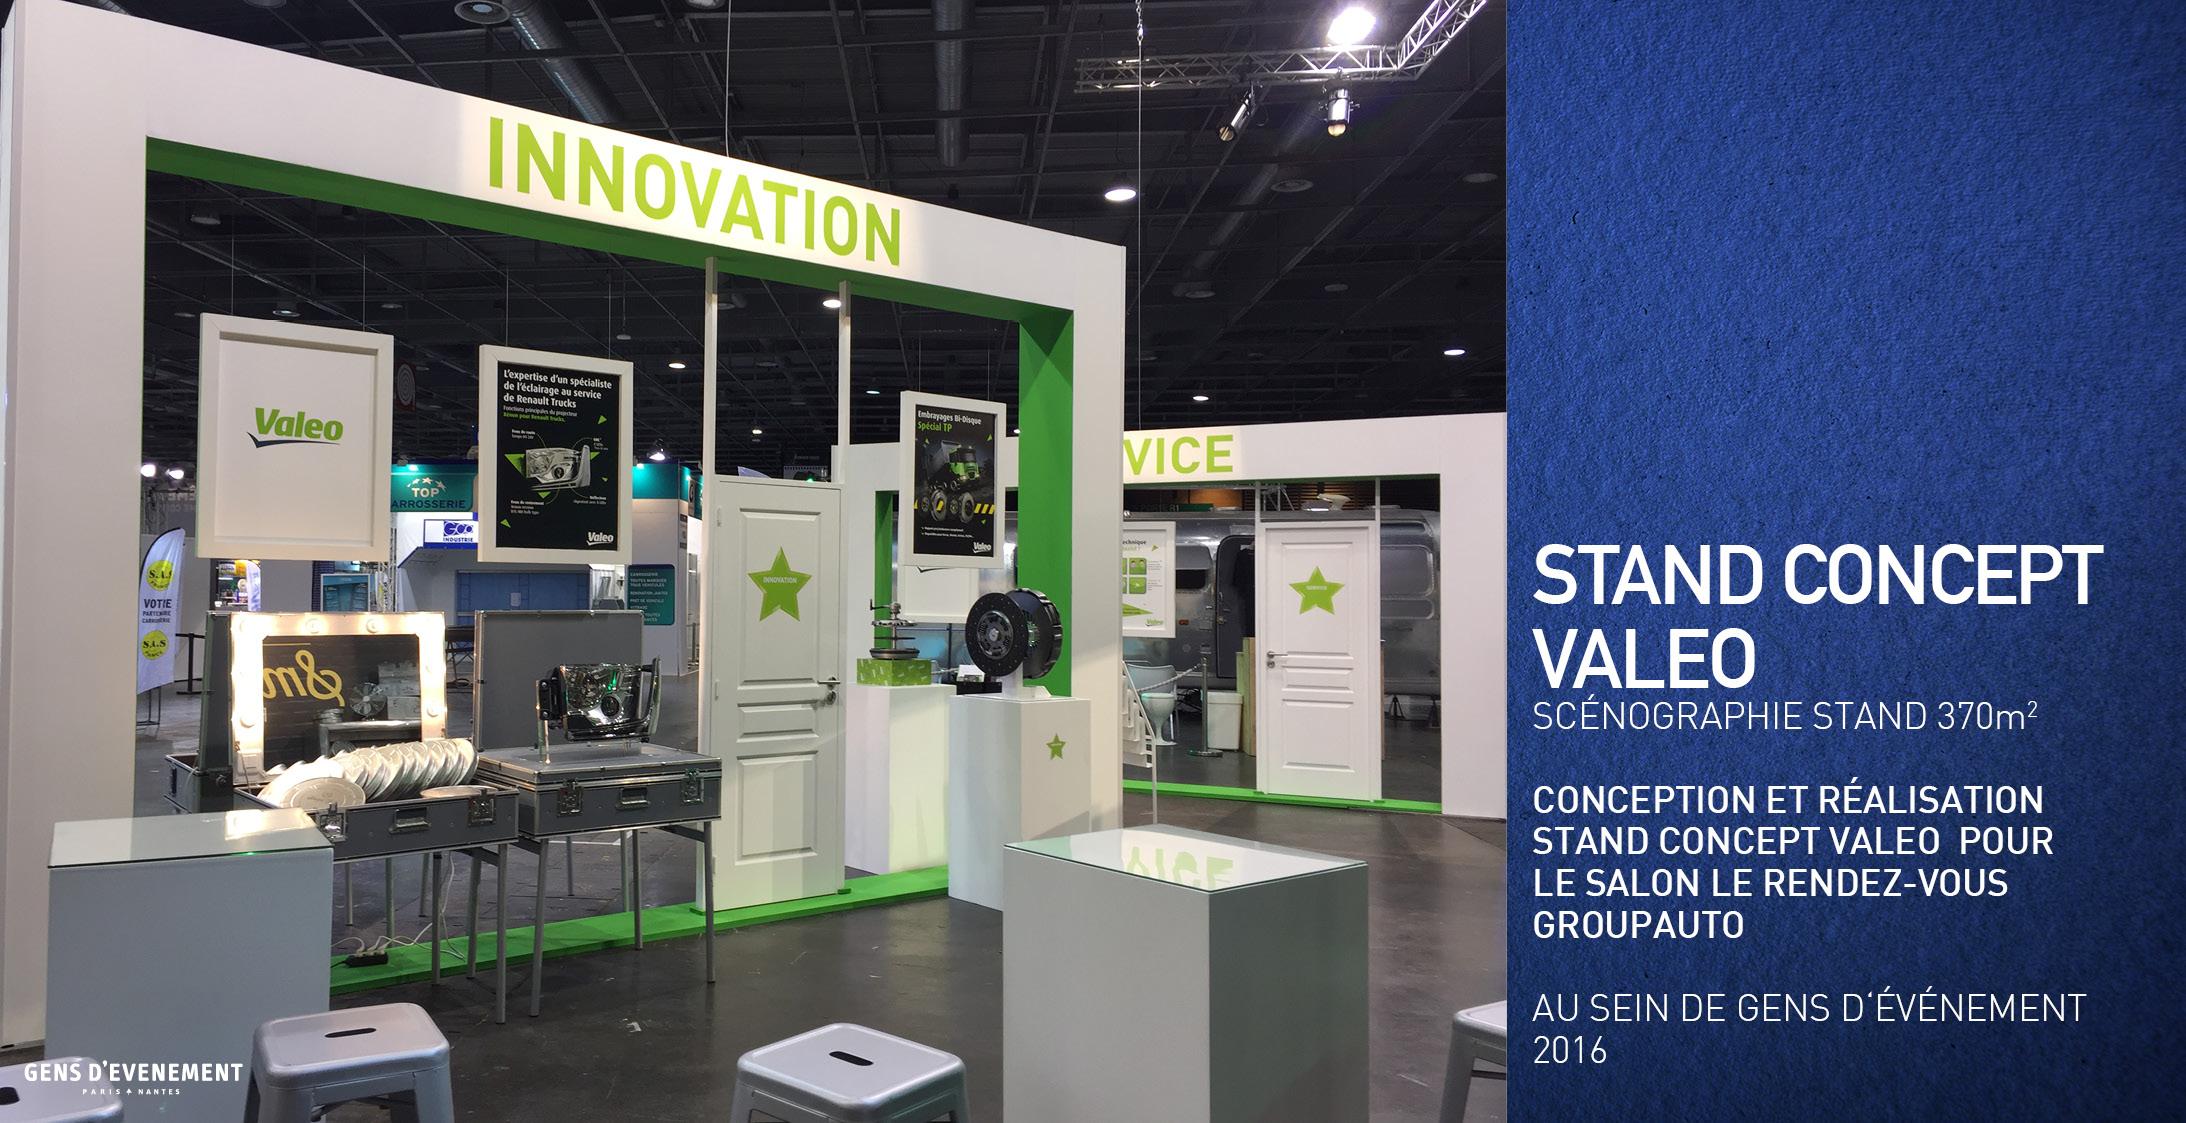 stand concept valeo